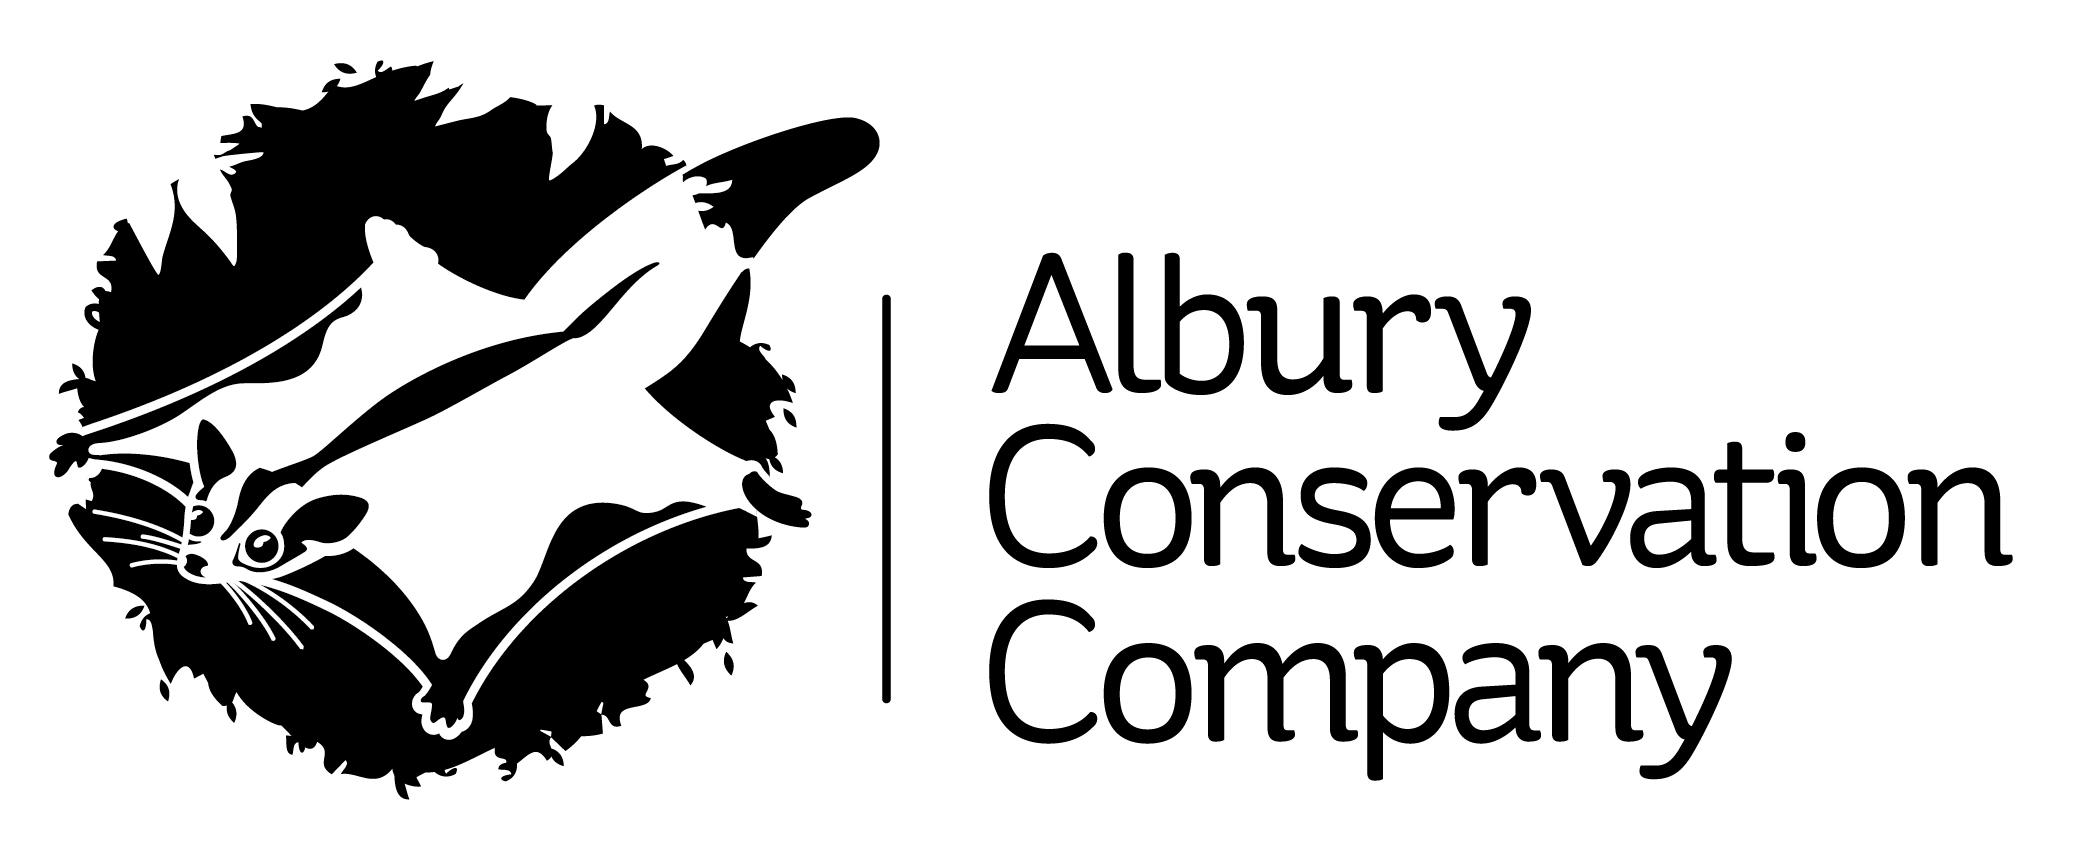 Albury Conserv Co_black.jpg